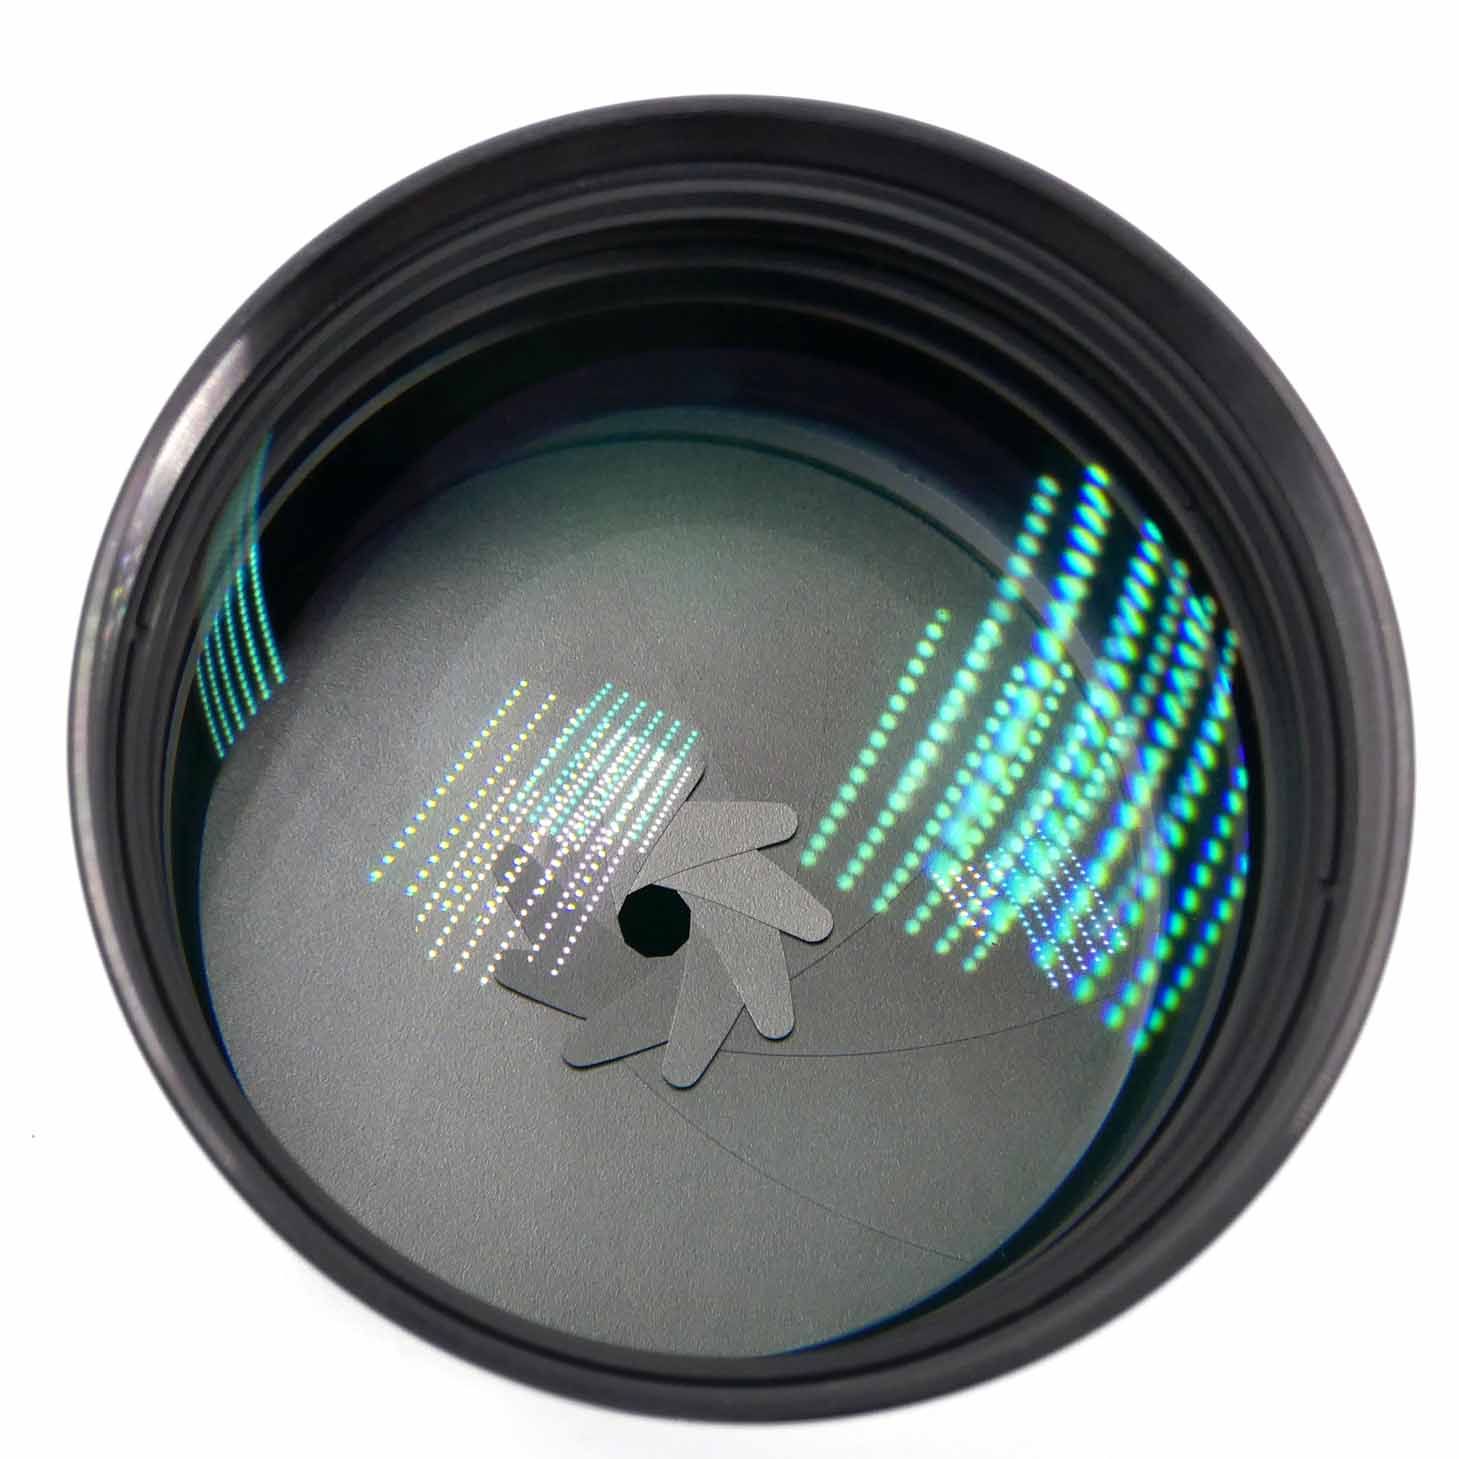 clean-cameras-Pentax-A--SMC-1.8-135mm-01